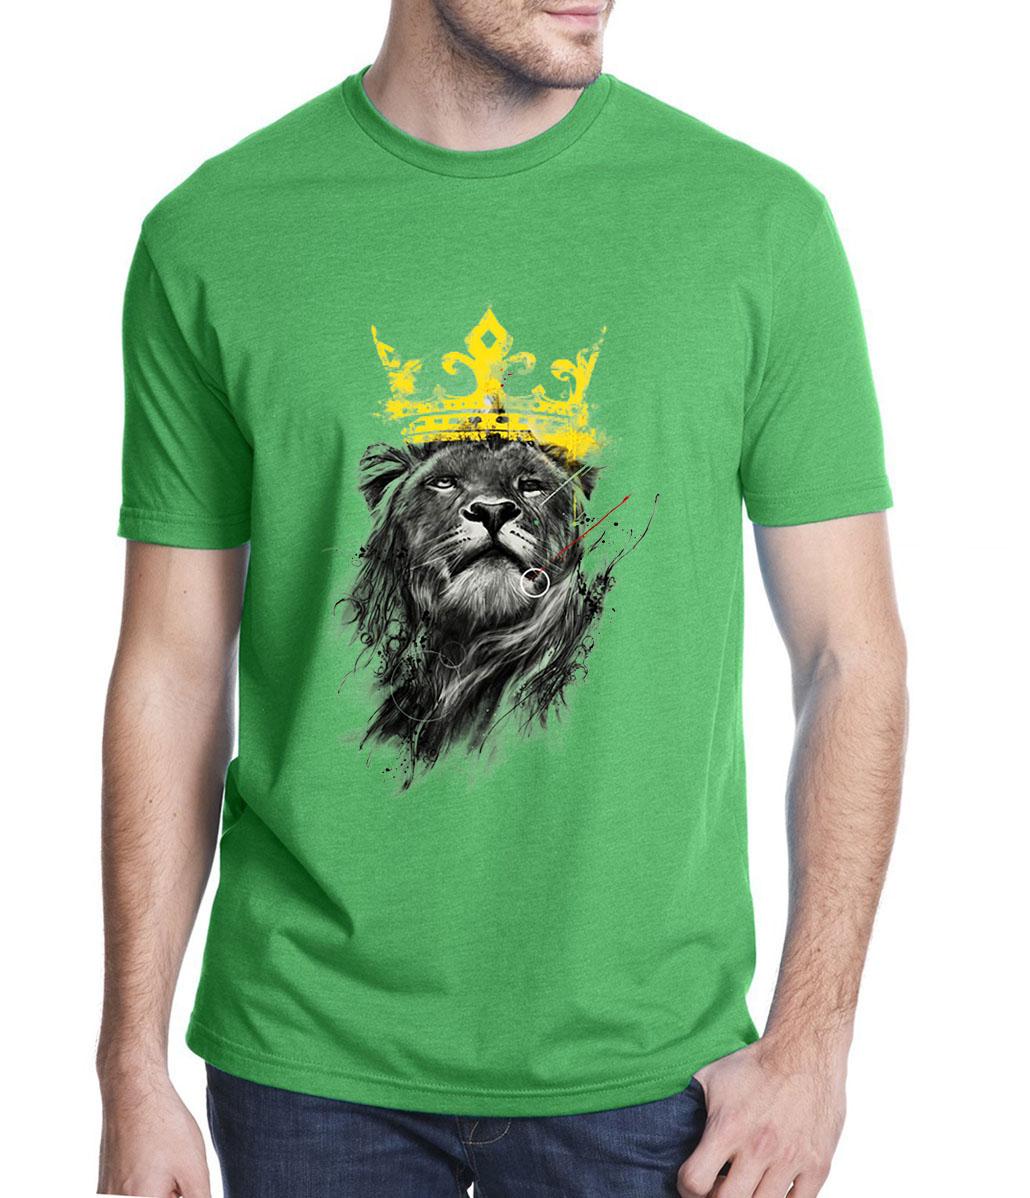 men's casual short sleeve t-shirt king of lion funny printed t shirts for man 2019 summer harajuku tee shirt homme O-neck tops